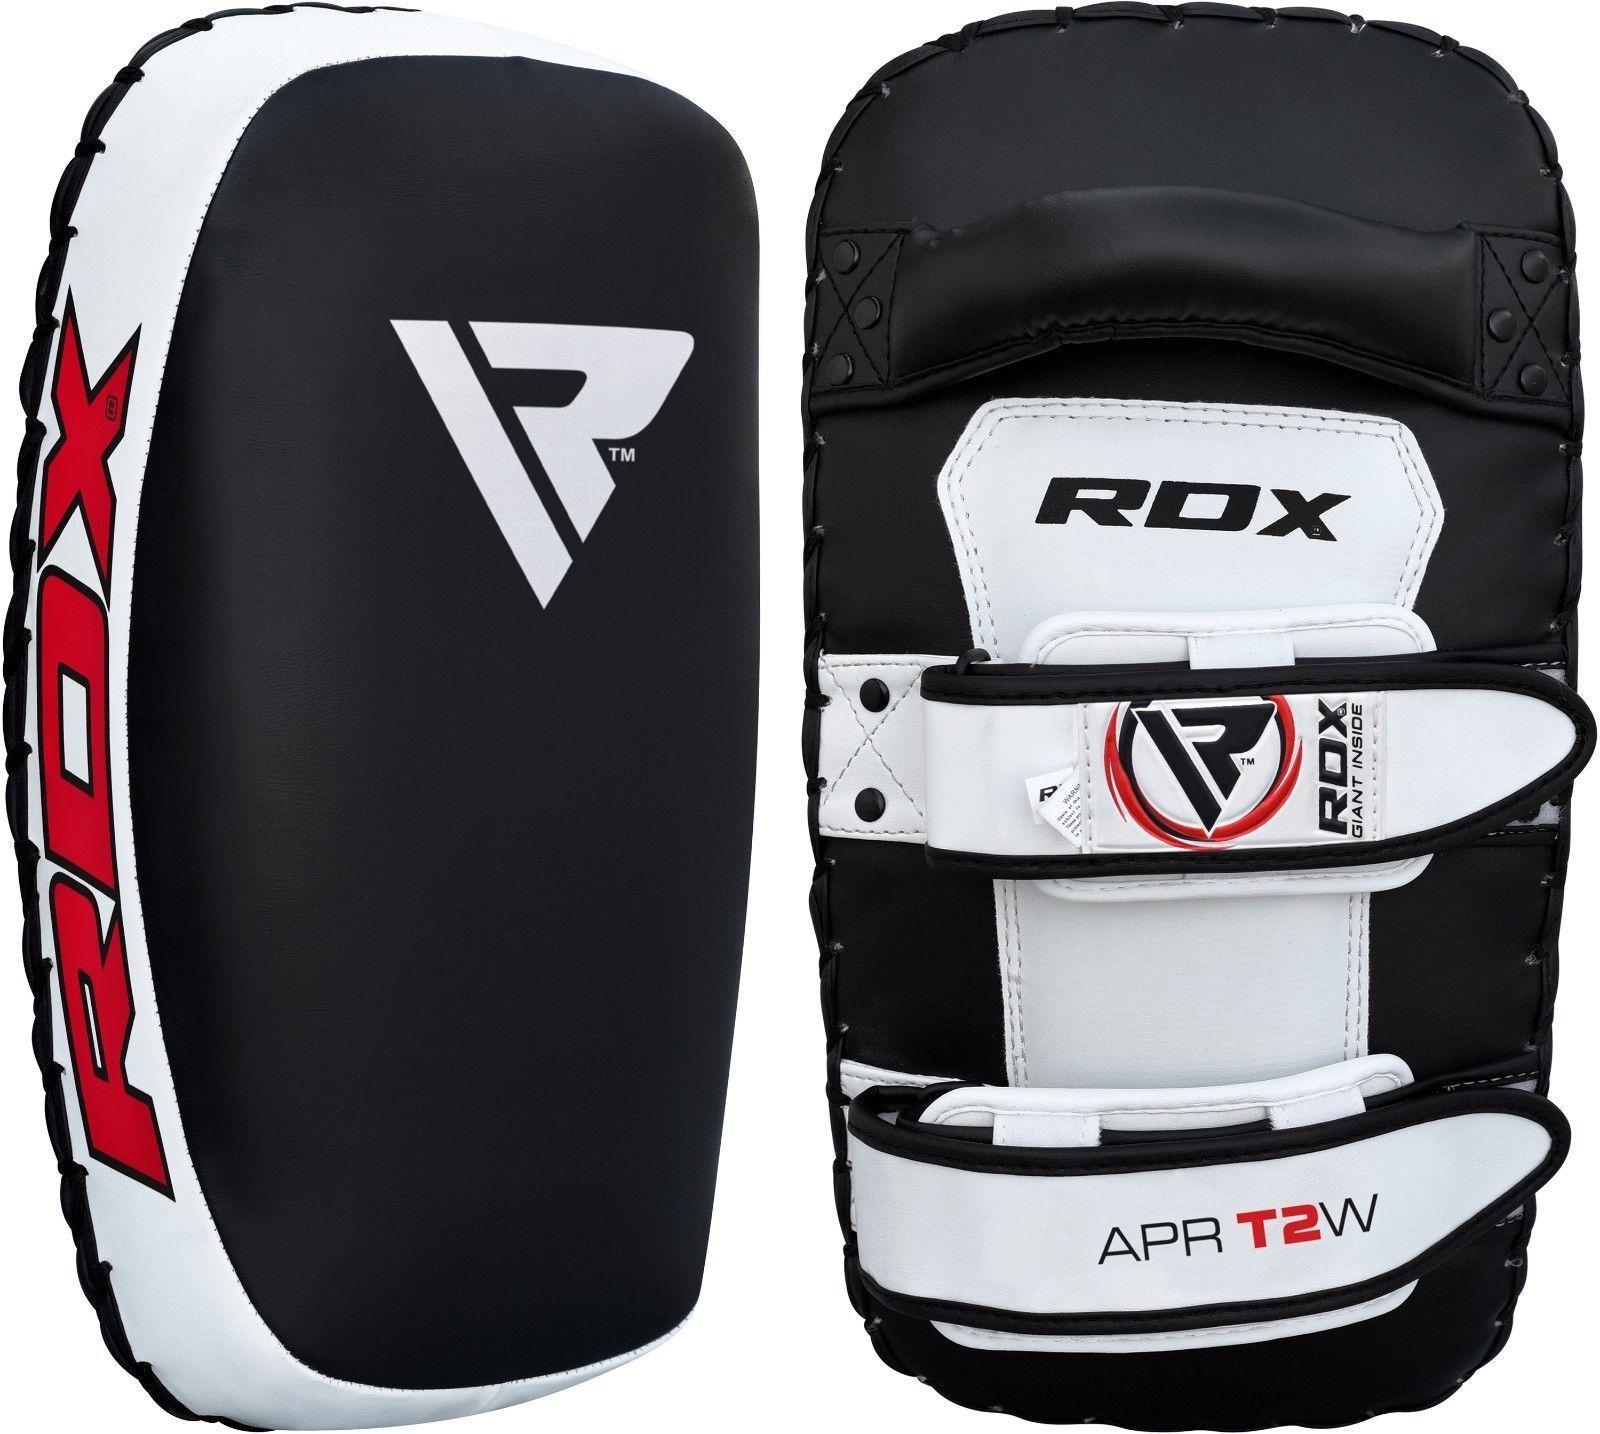 RDX Thai Kick Boxing Strike Curved Arm Pad MMA Focus Muay Punching Shield RD OS